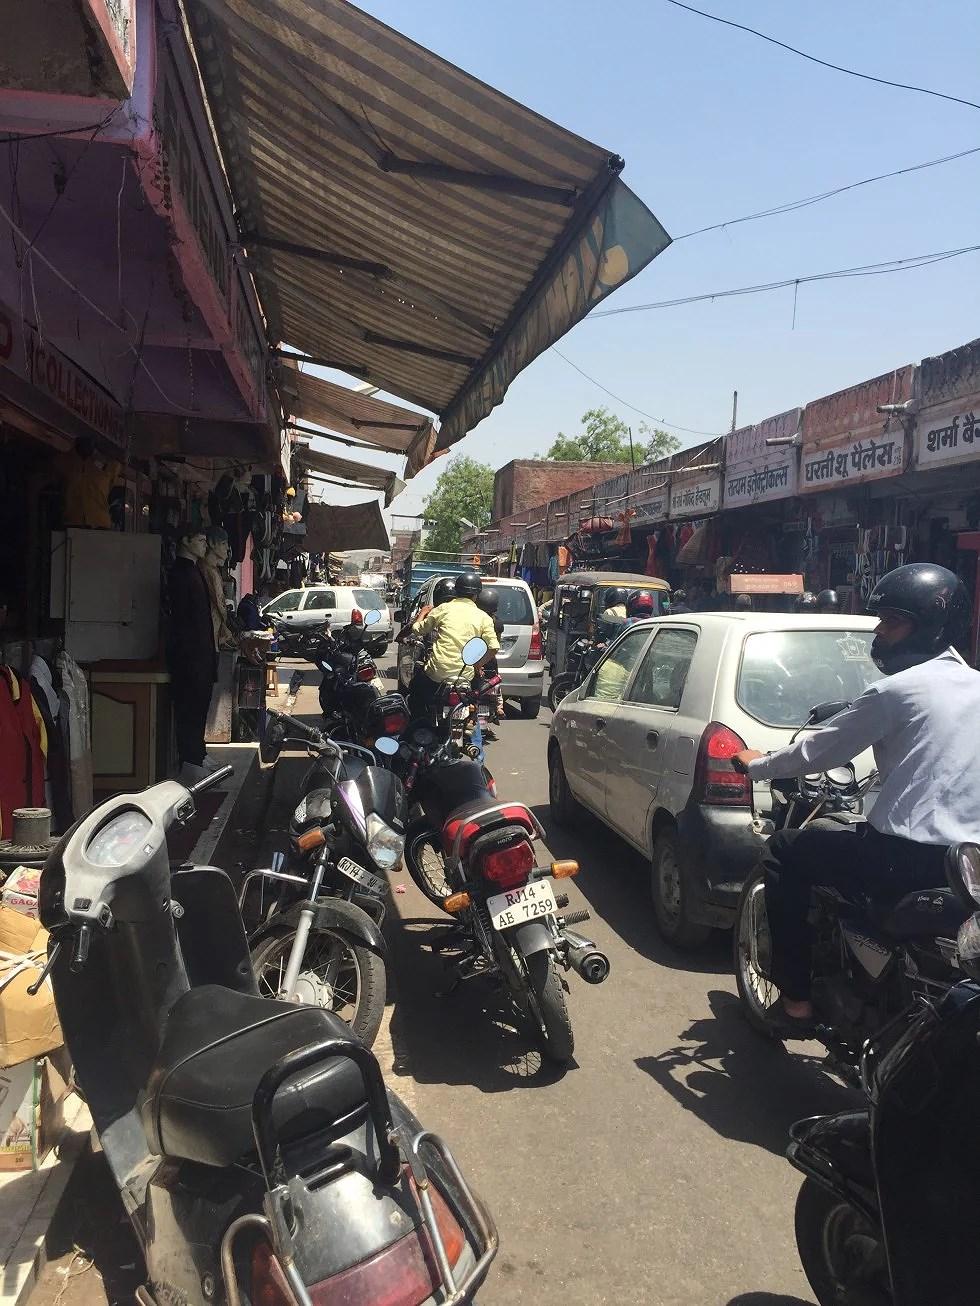 En travl markedsgade.